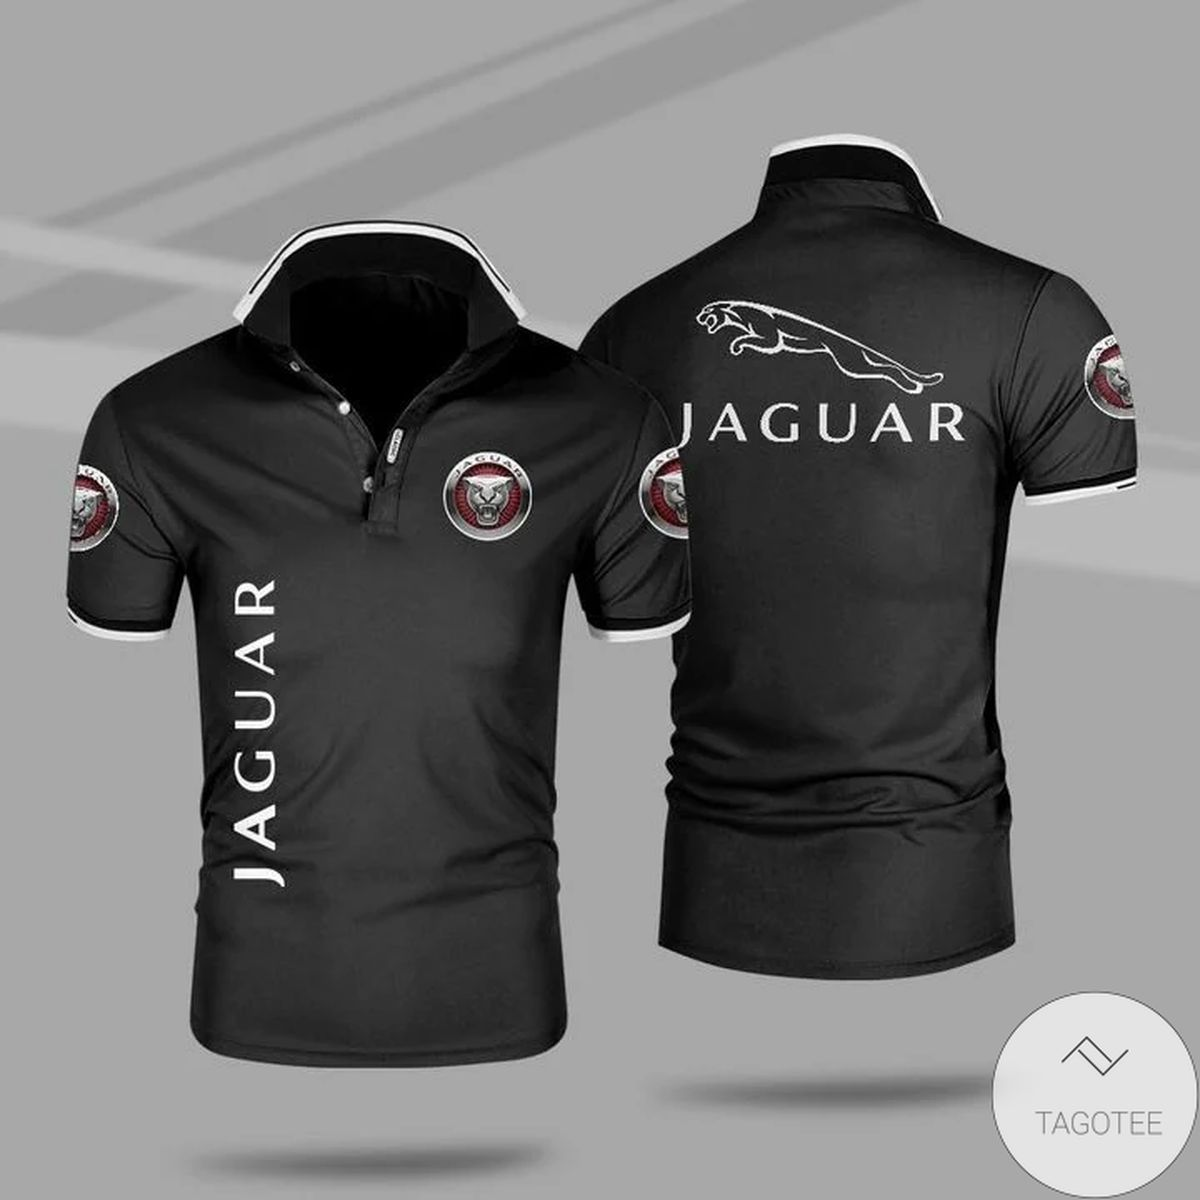 Jaguar Polo Shirt